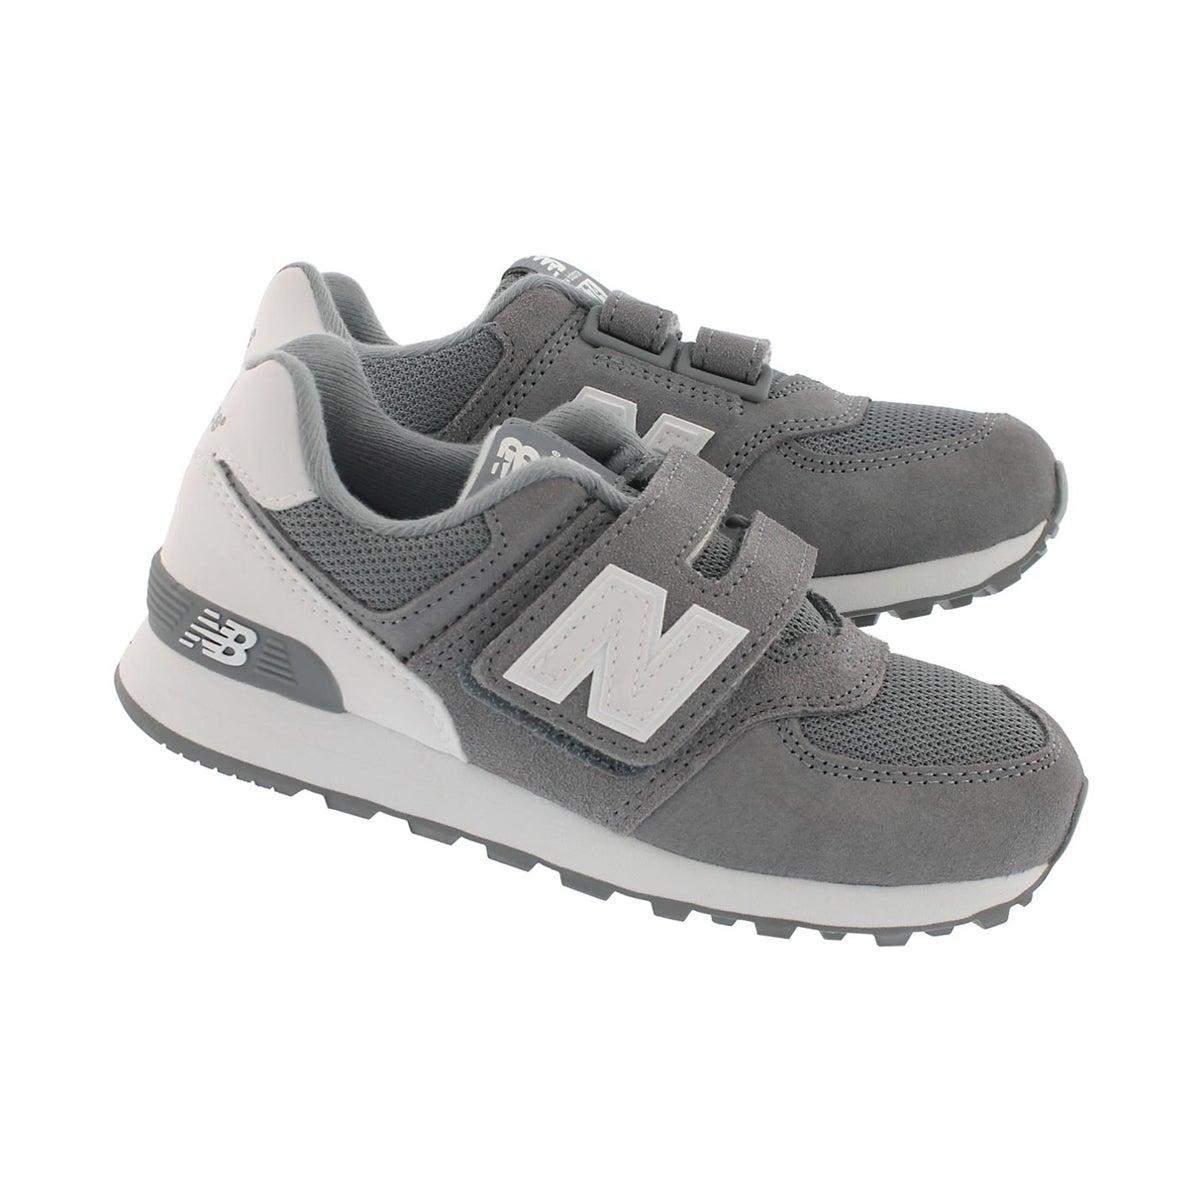 Bys 574 grey/white sneaker